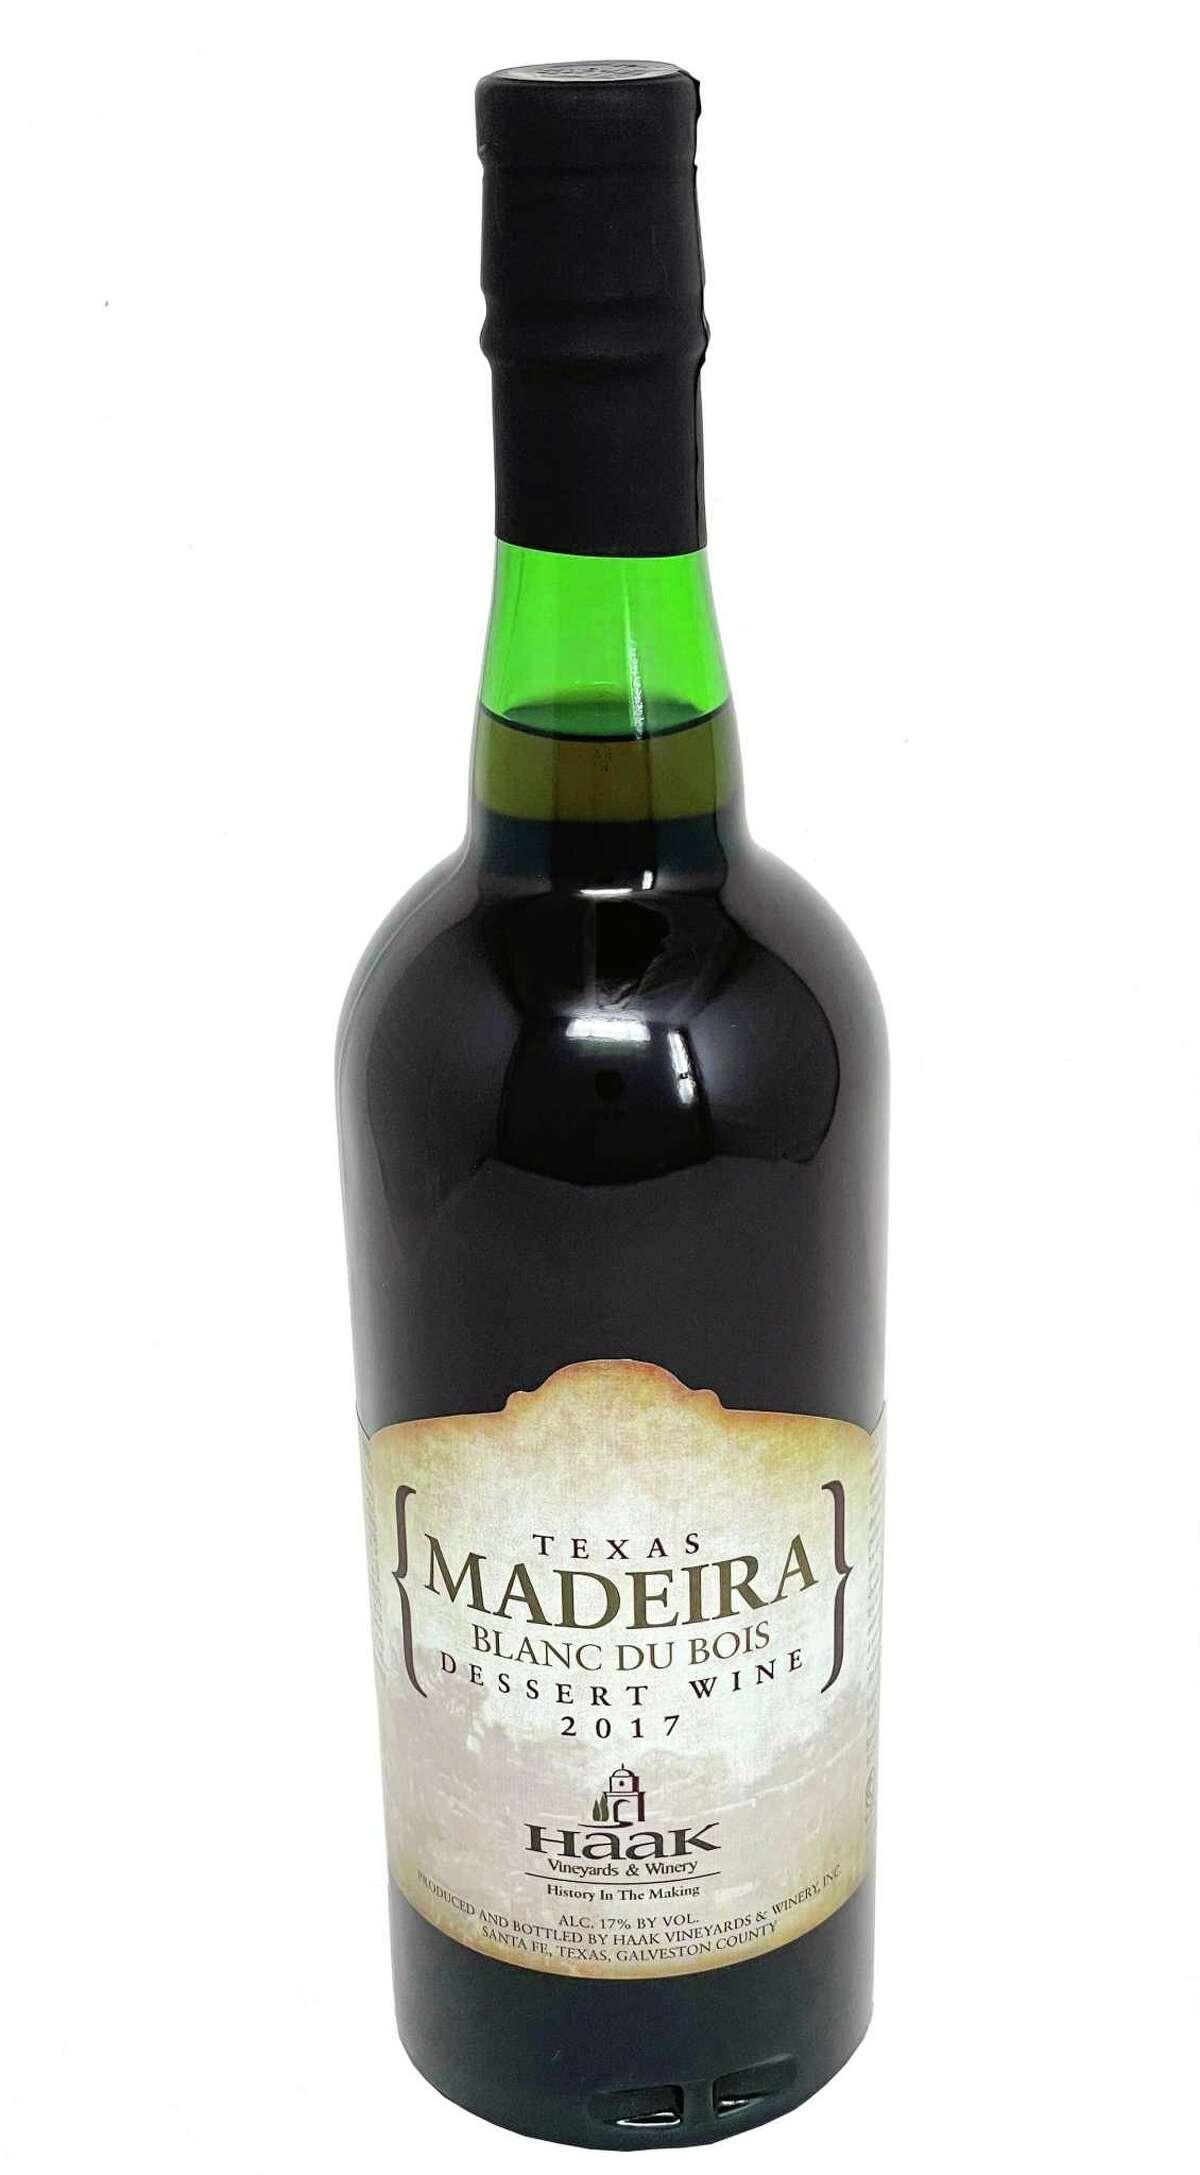 Haak Vineyards and Winery, 2017 Madeira Blanc Du Bois, Texas